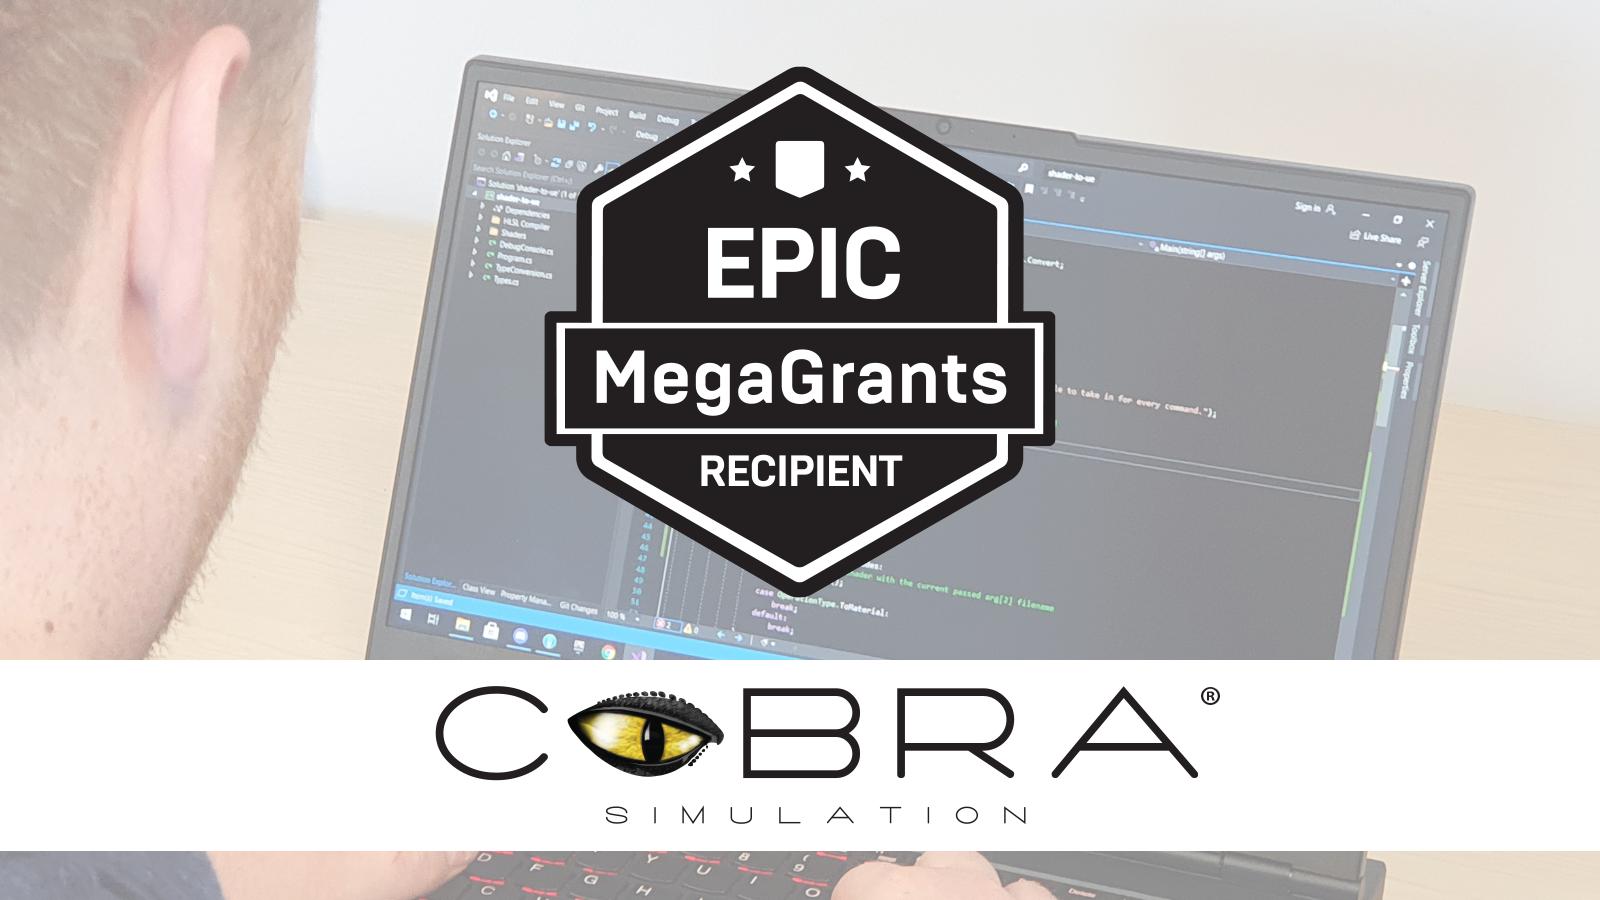 Cobra 1600x900 sponsored content october